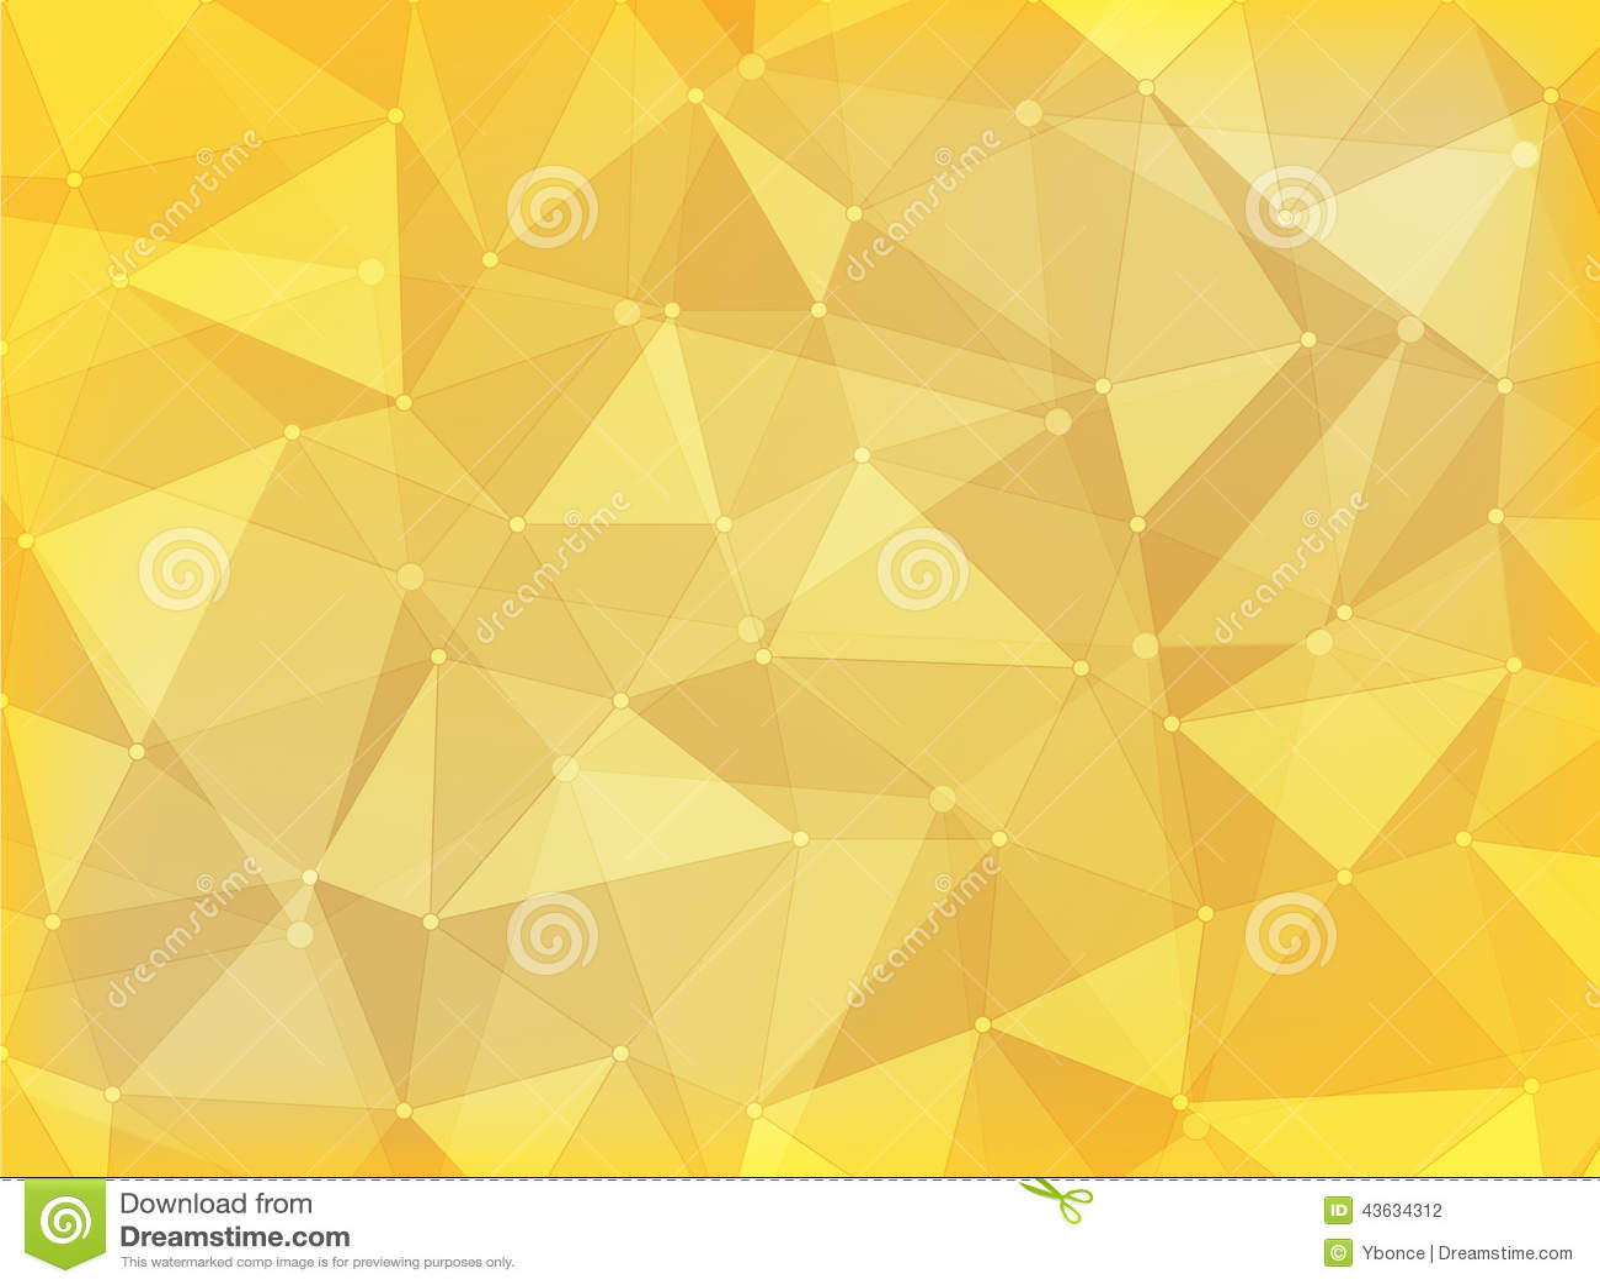 geometric yellow background illustration - photo #10